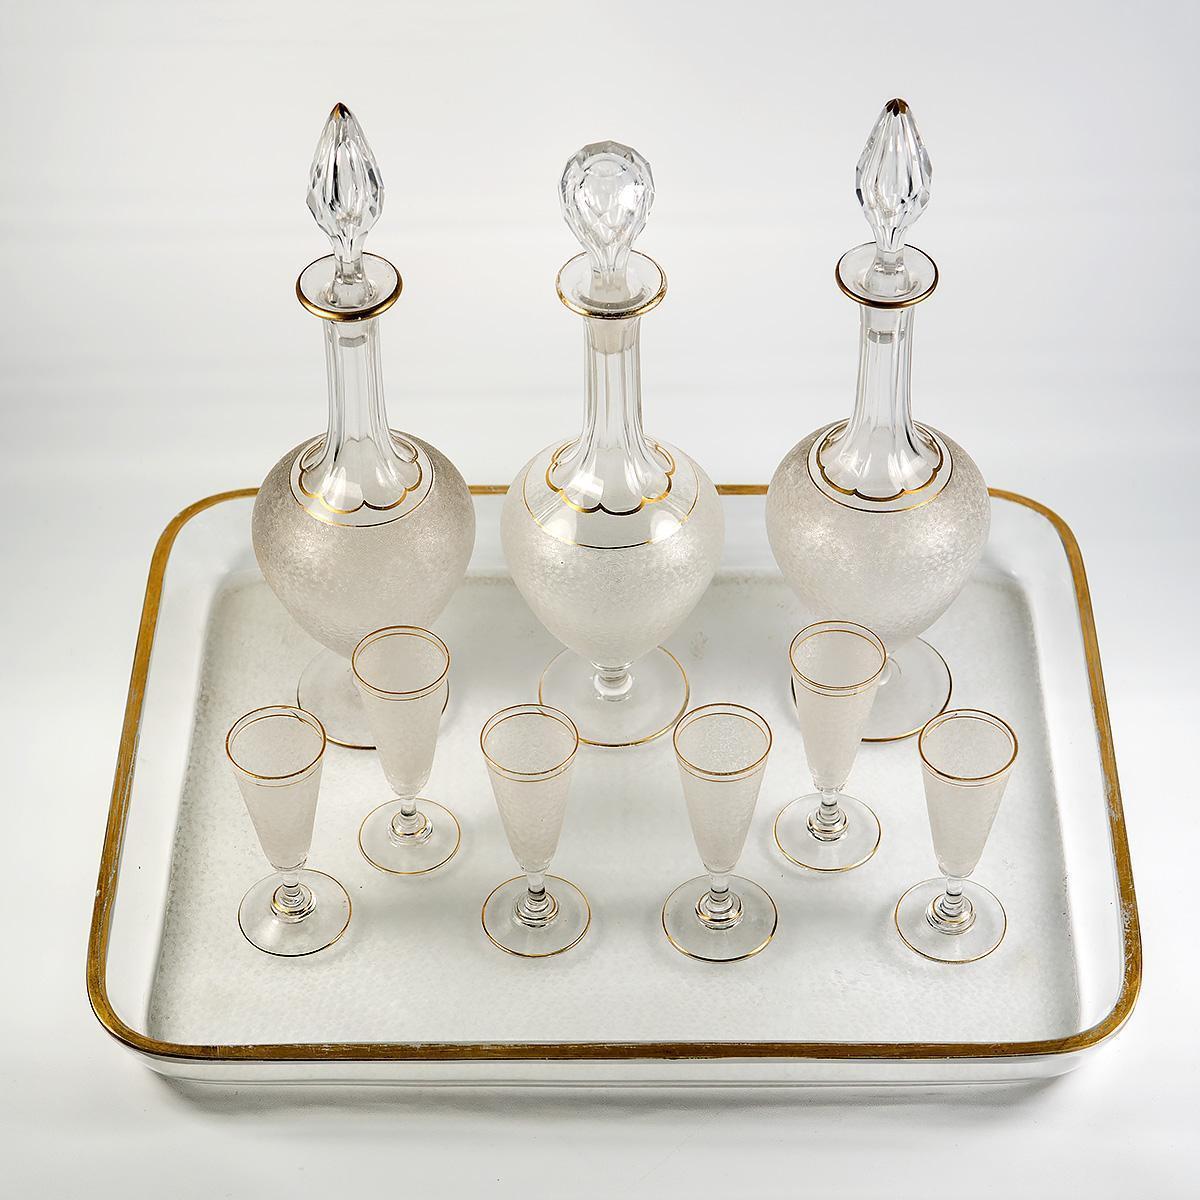 Antique French Liqueur Service, St. Louis - 3 Decanters, 6 Cordials, Stems, Tray